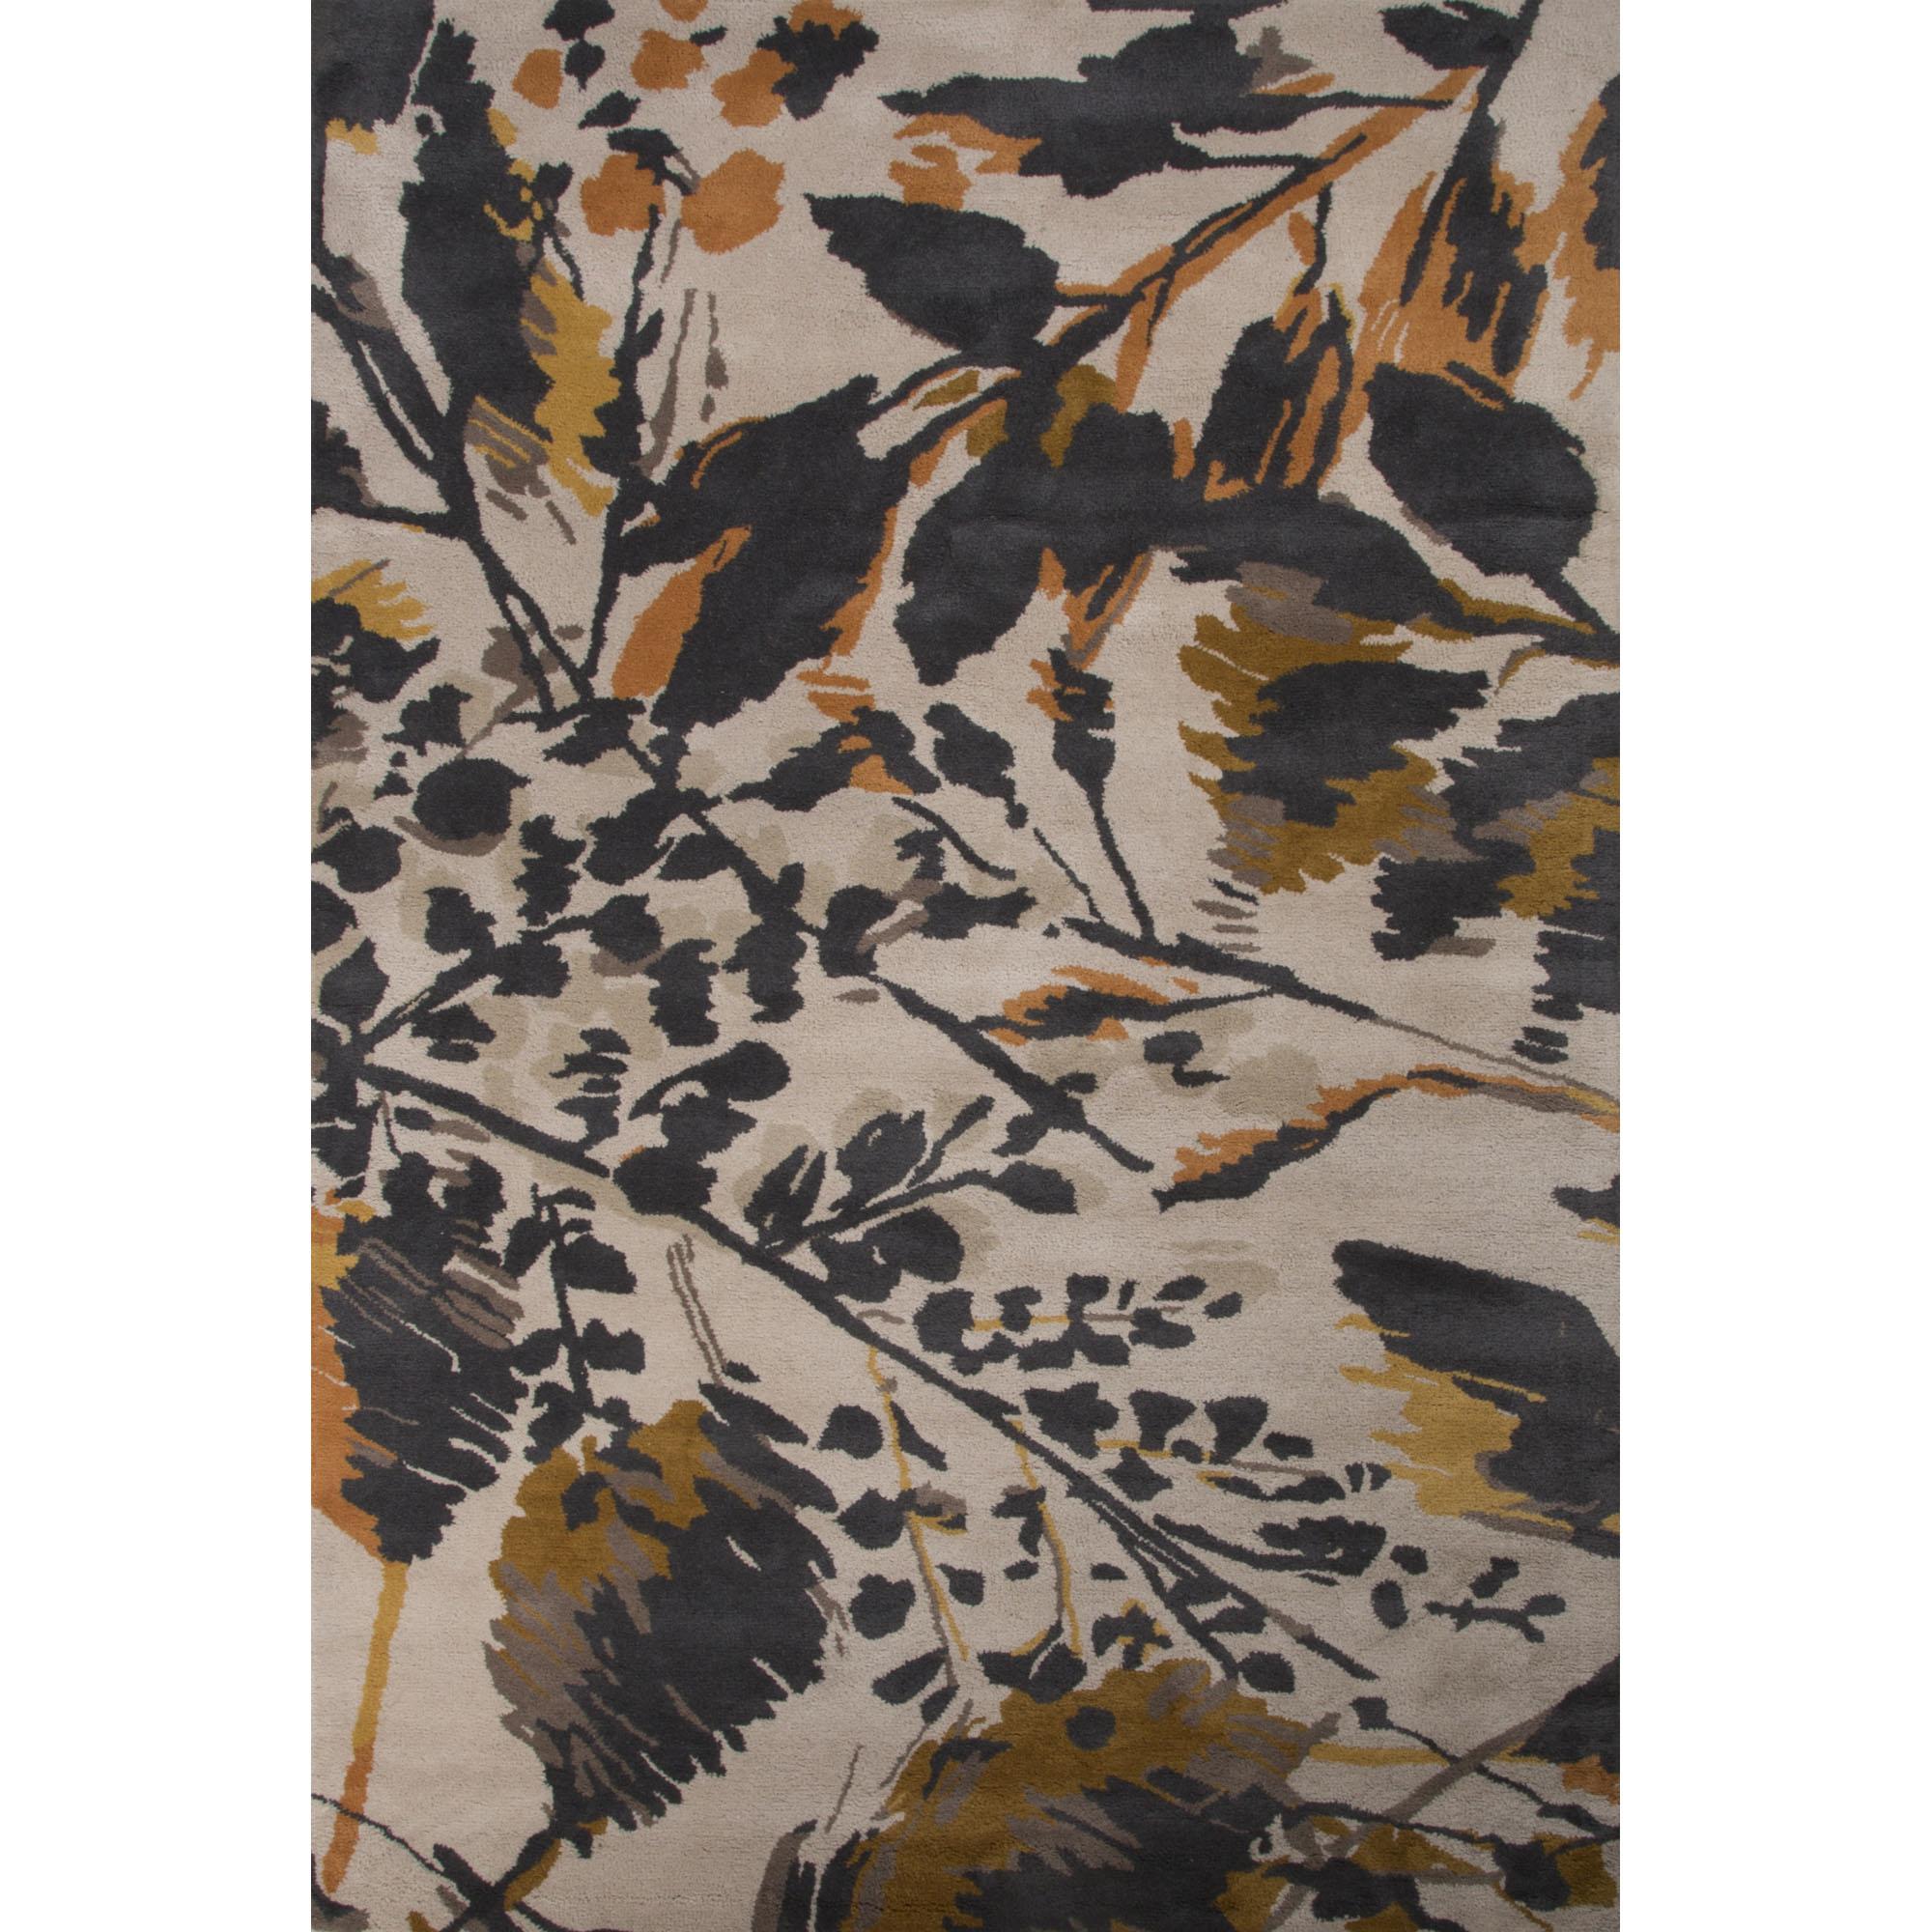 JAIPUR Rugs En Casa By Luli Sanchez Tufted 5 x 8 Rug - Item Number: RUG116015